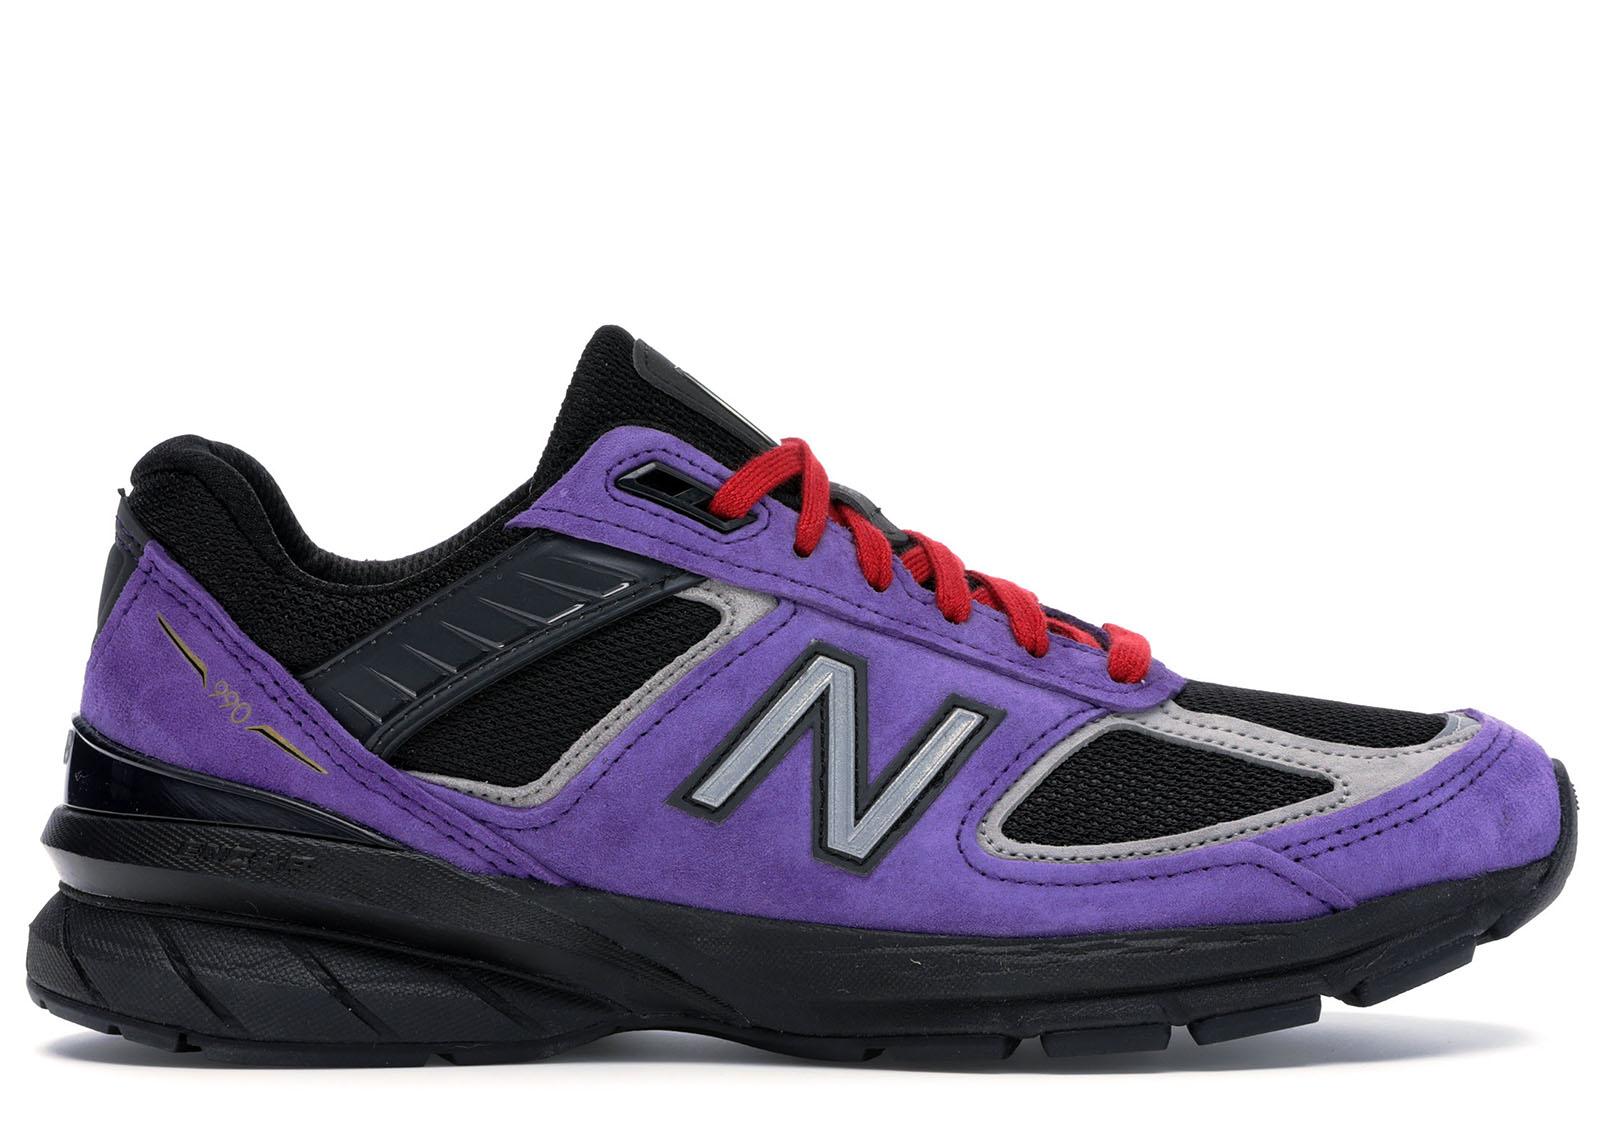 New Balance 990v5 Kawhi Leonard